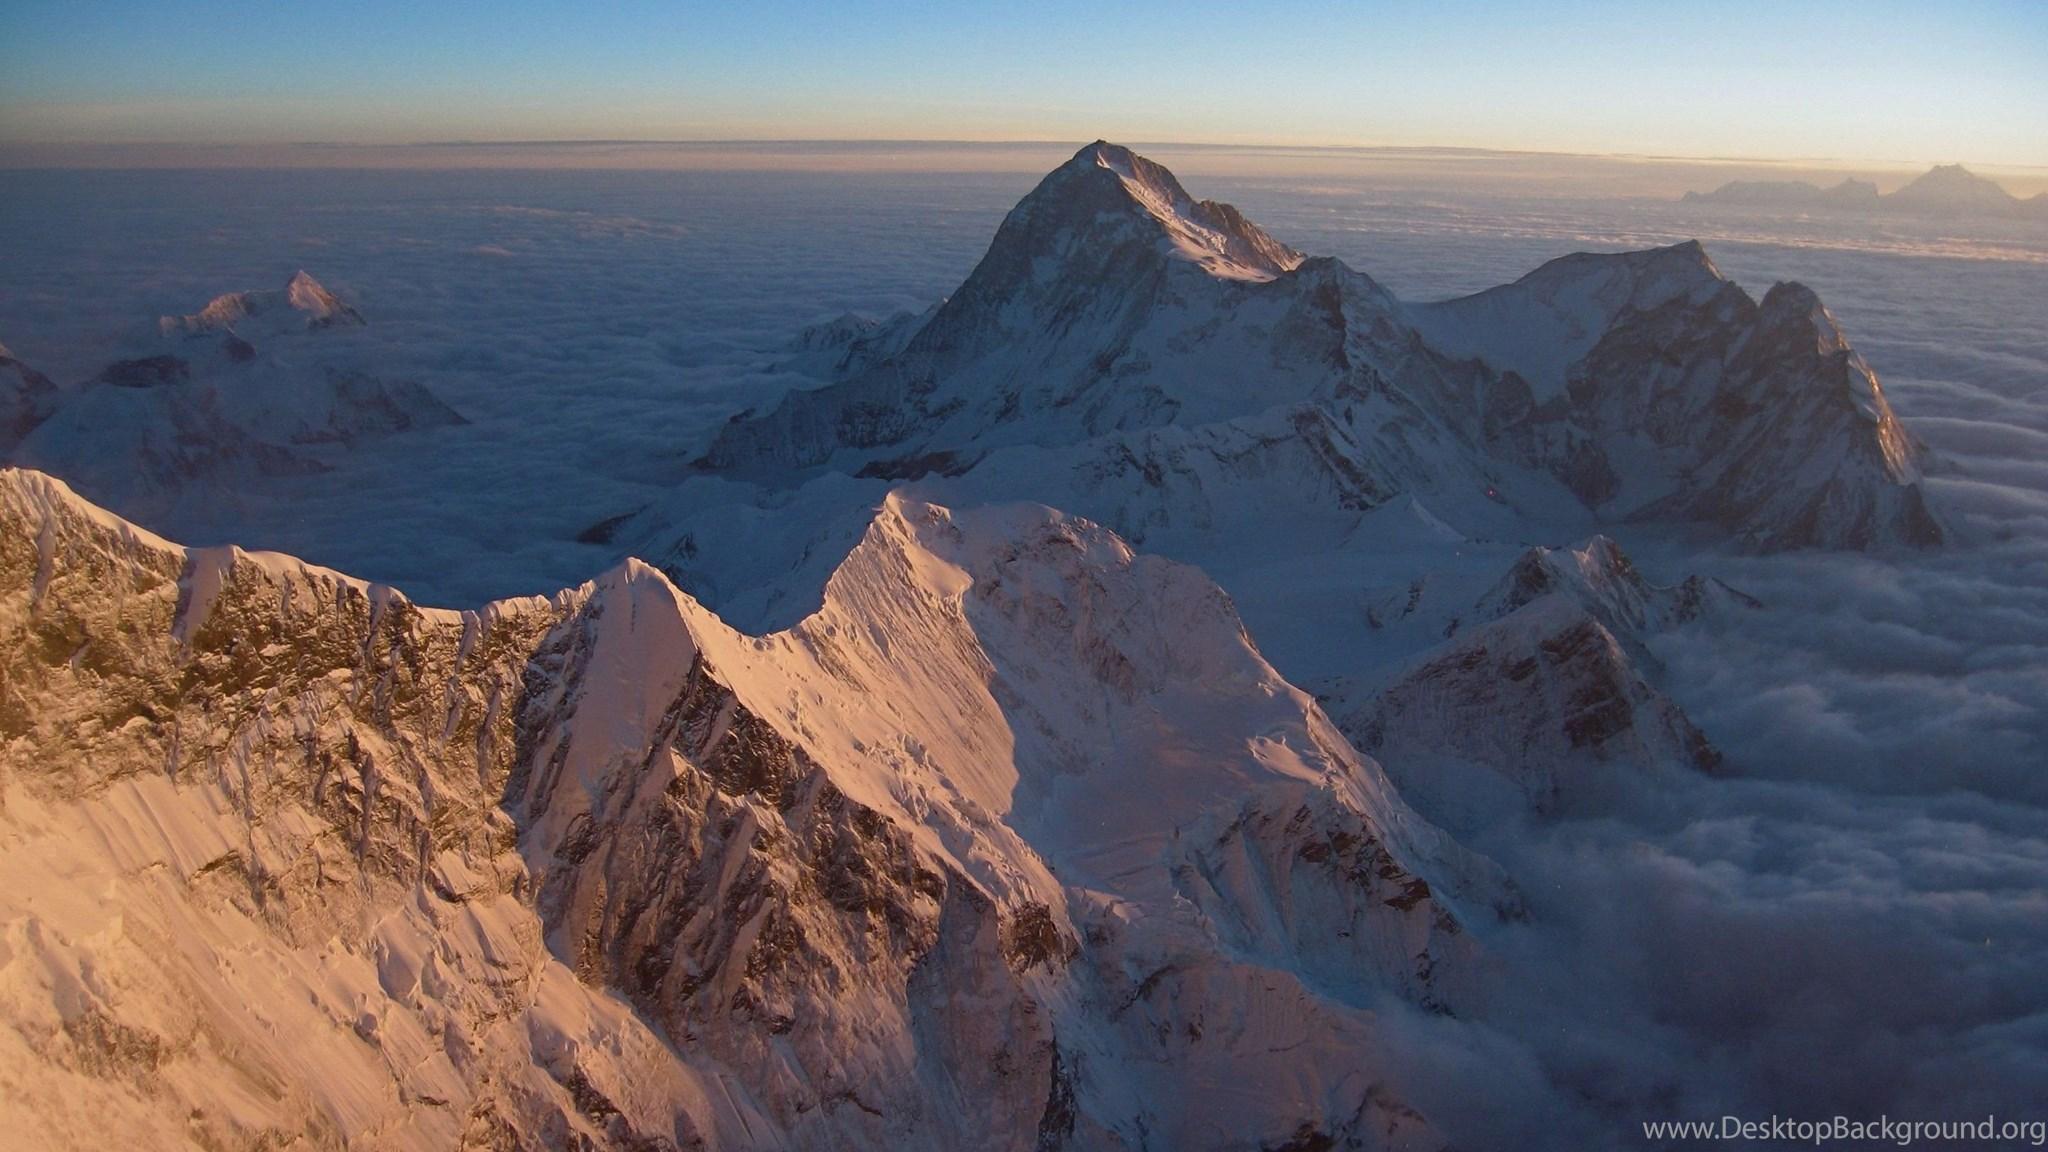 Mount Everest Wallpapers Nature Wallpapers Desktop Background